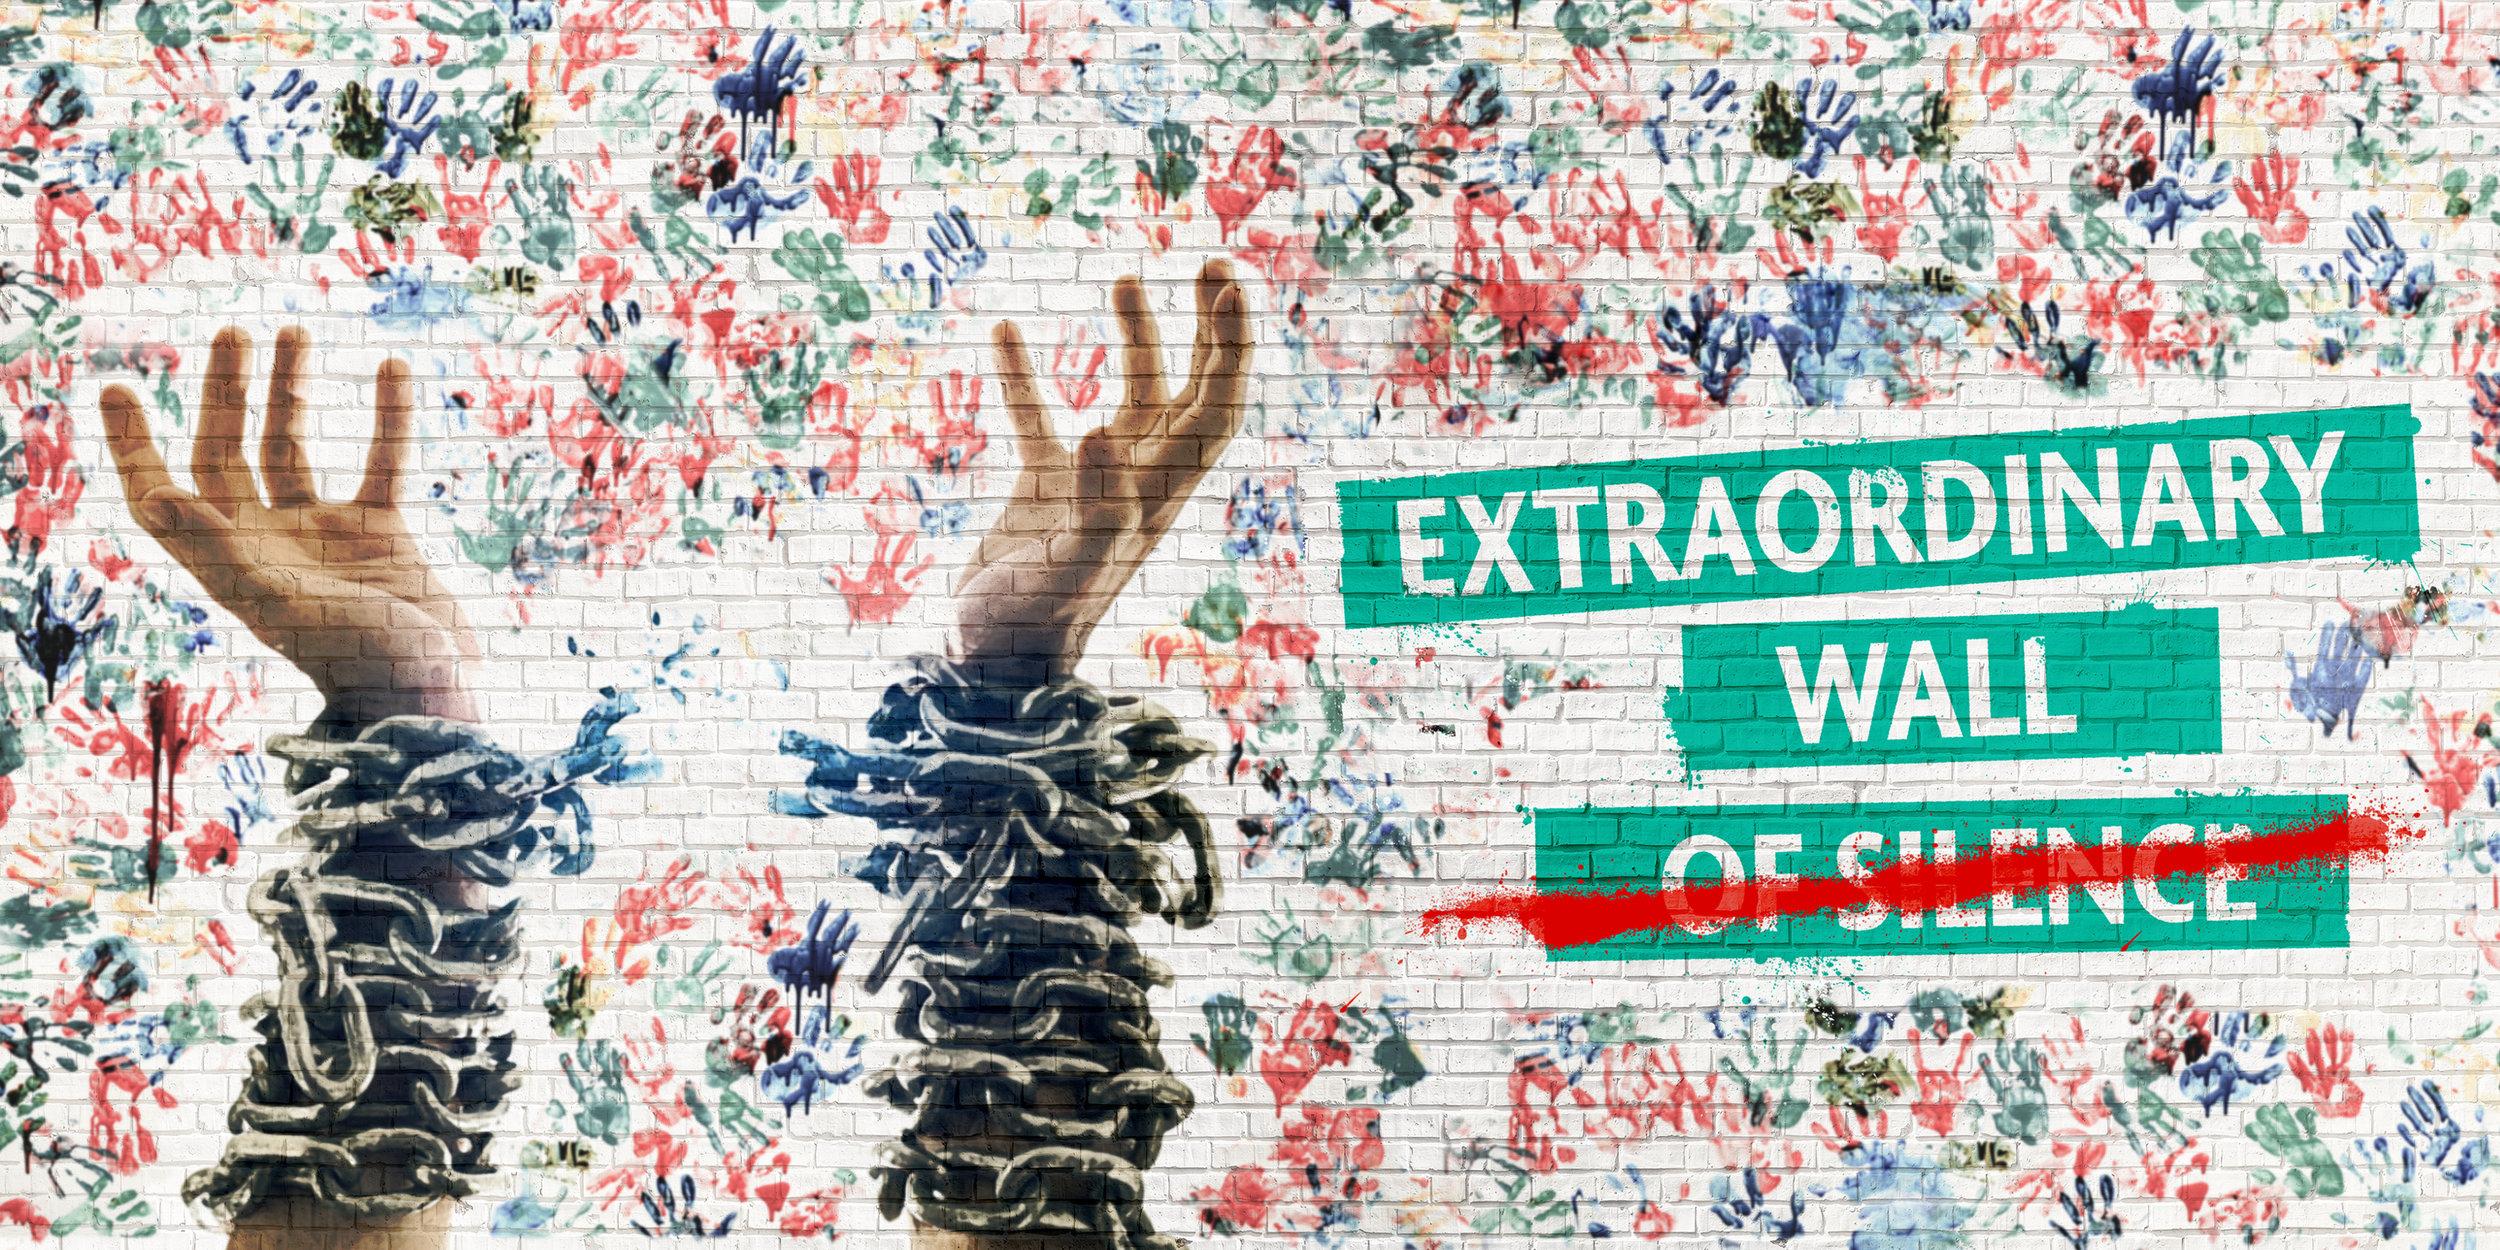 Extraordinary Wall o̶f̶ ̶S̶i̶l̶e̶n̶c̶e̶ (with title) LANDSCAPE Image Credit Peter Moffat.jpg